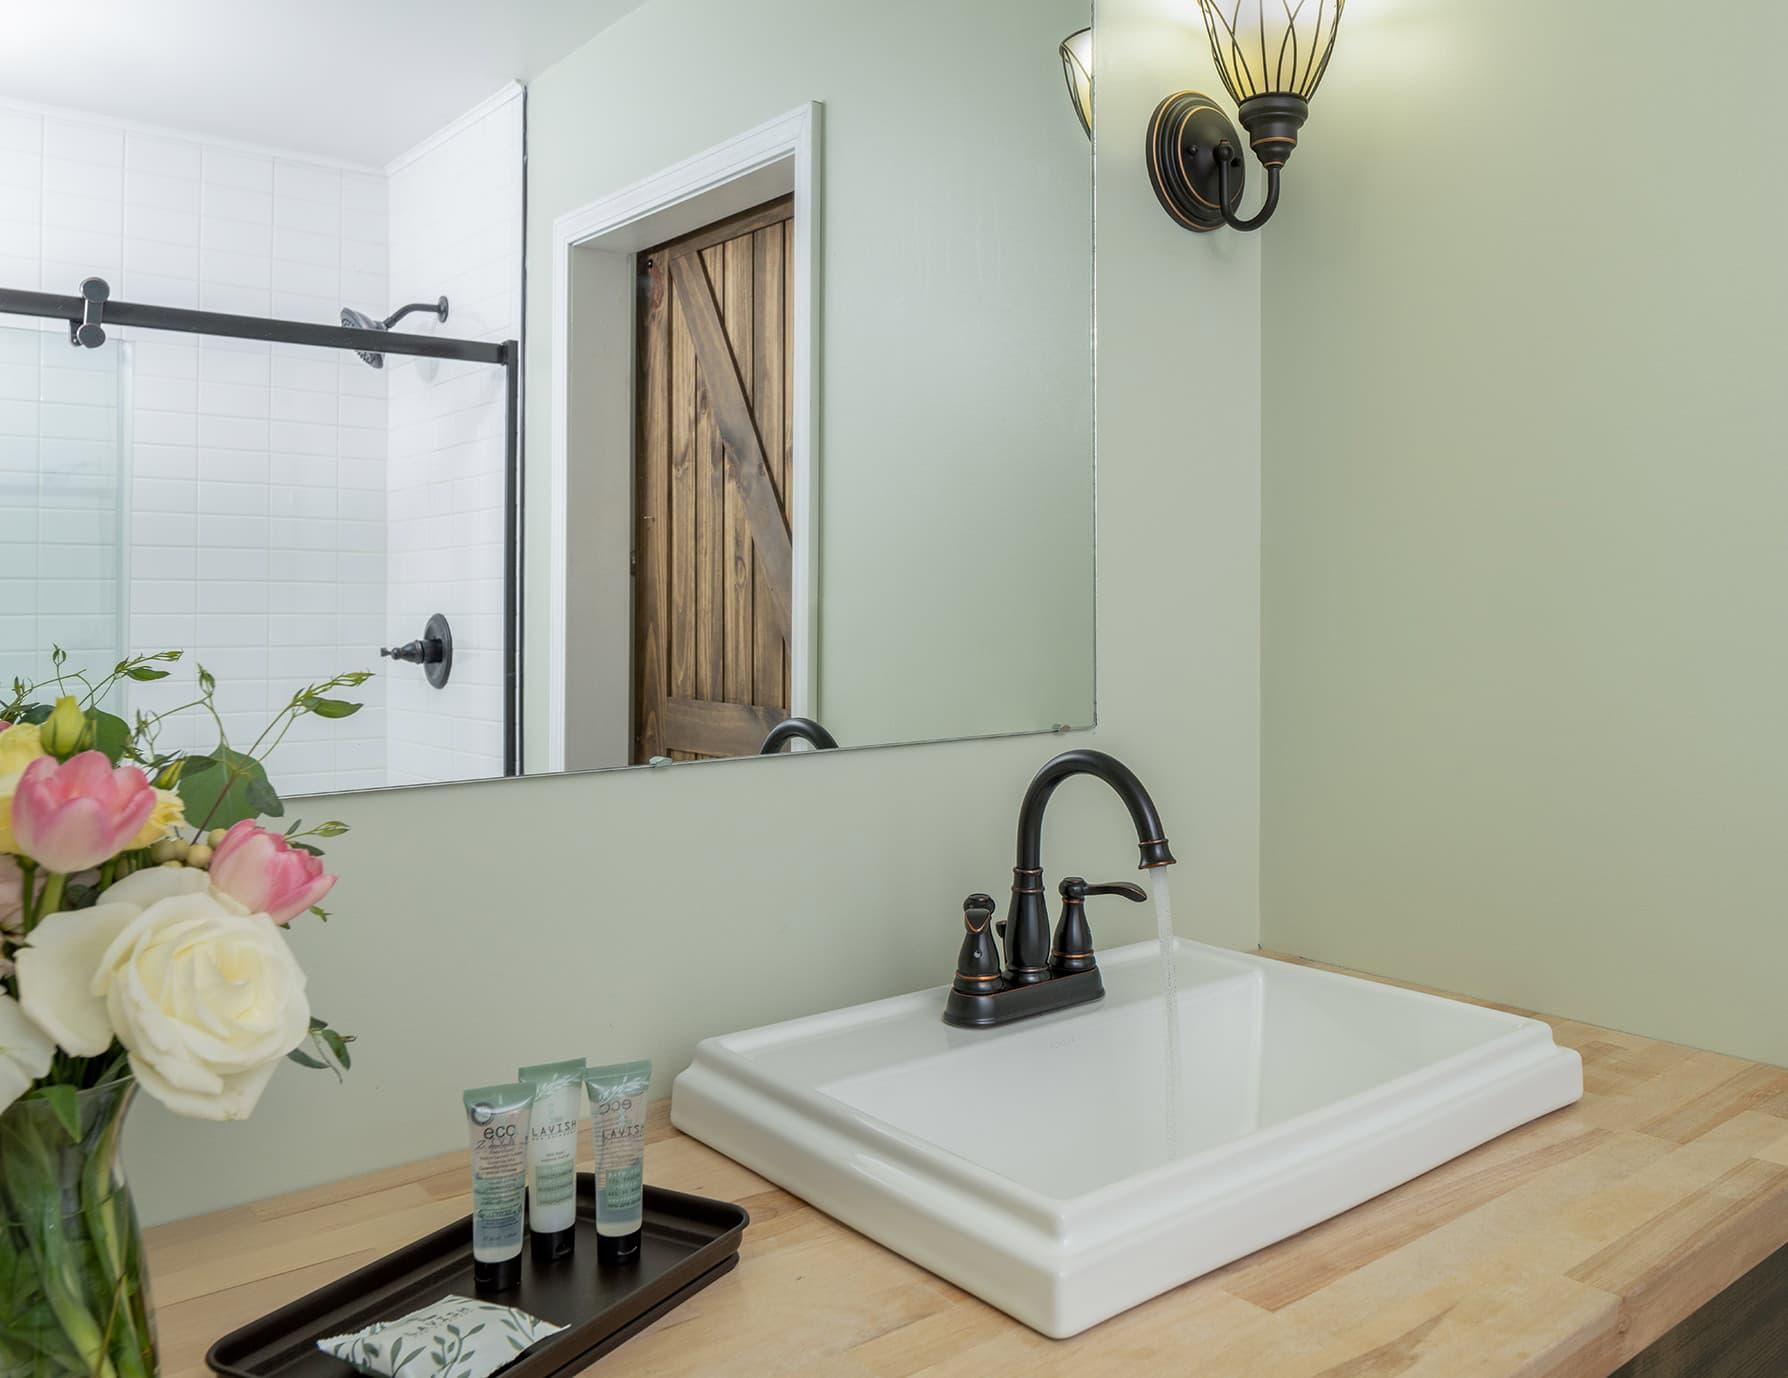 Suite Magnolia bathroom sink